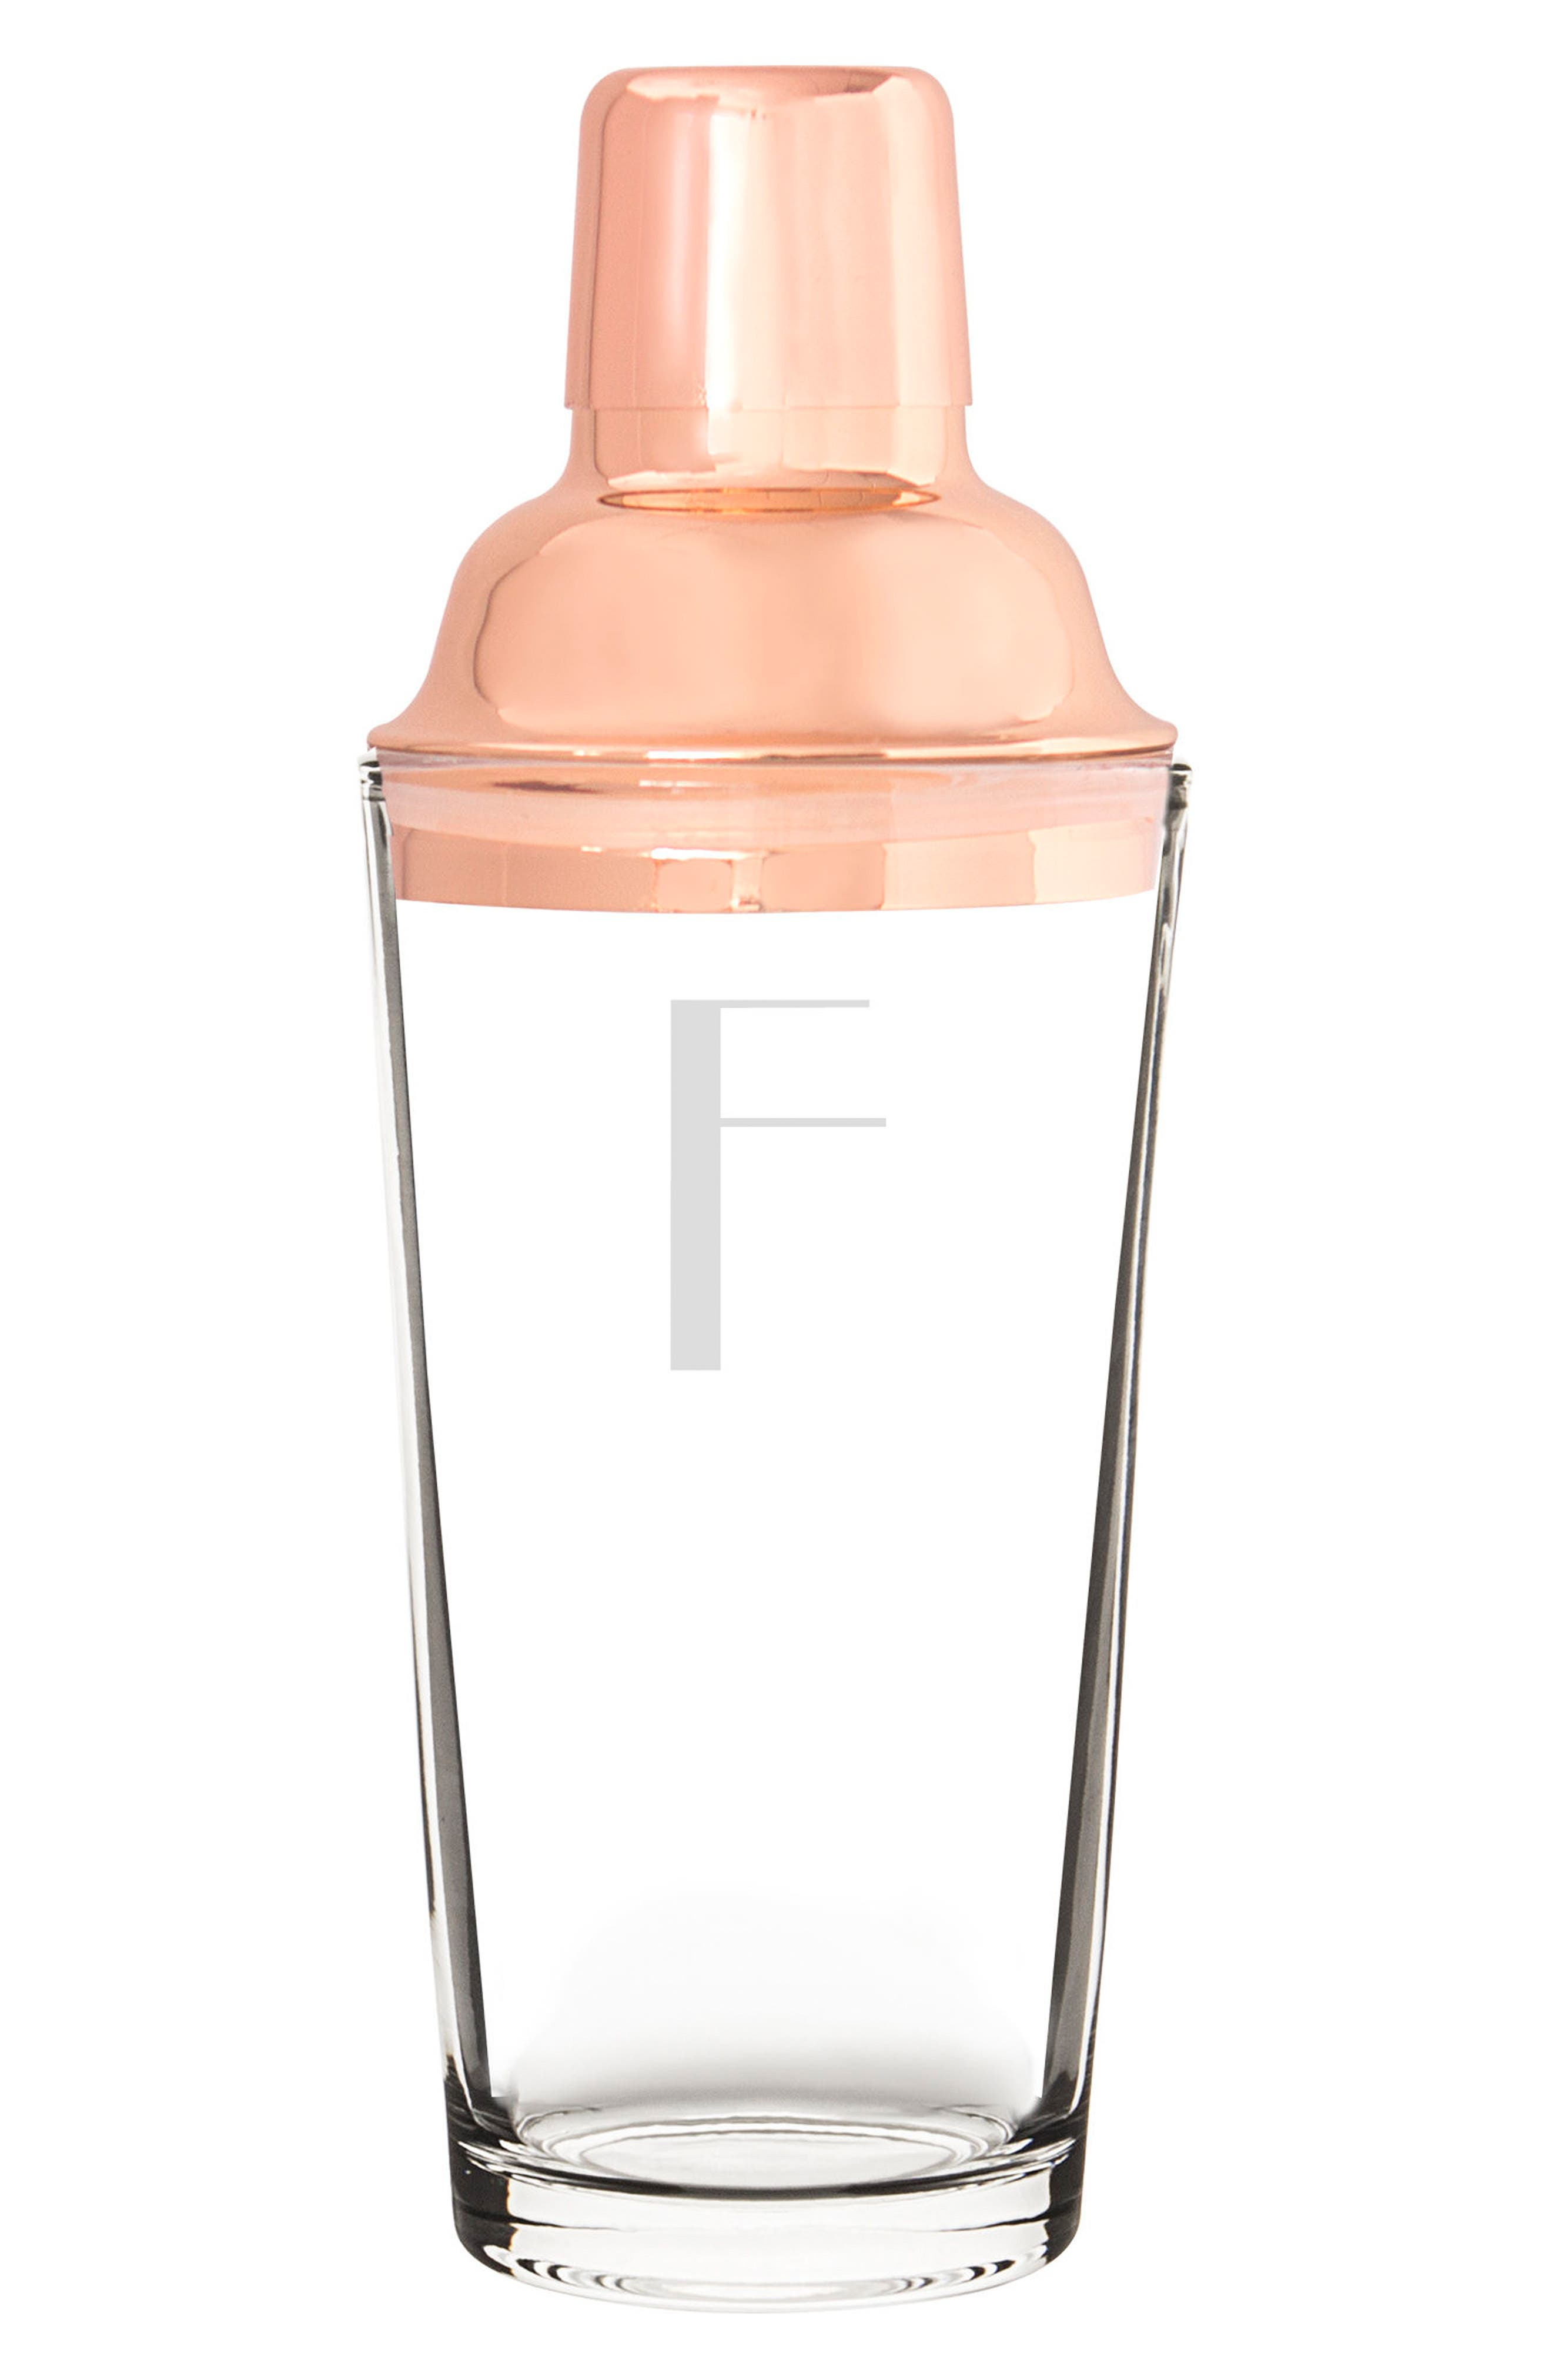 Monogram Coppertone Cocktail Shaker,                             Main thumbnail 7, color,